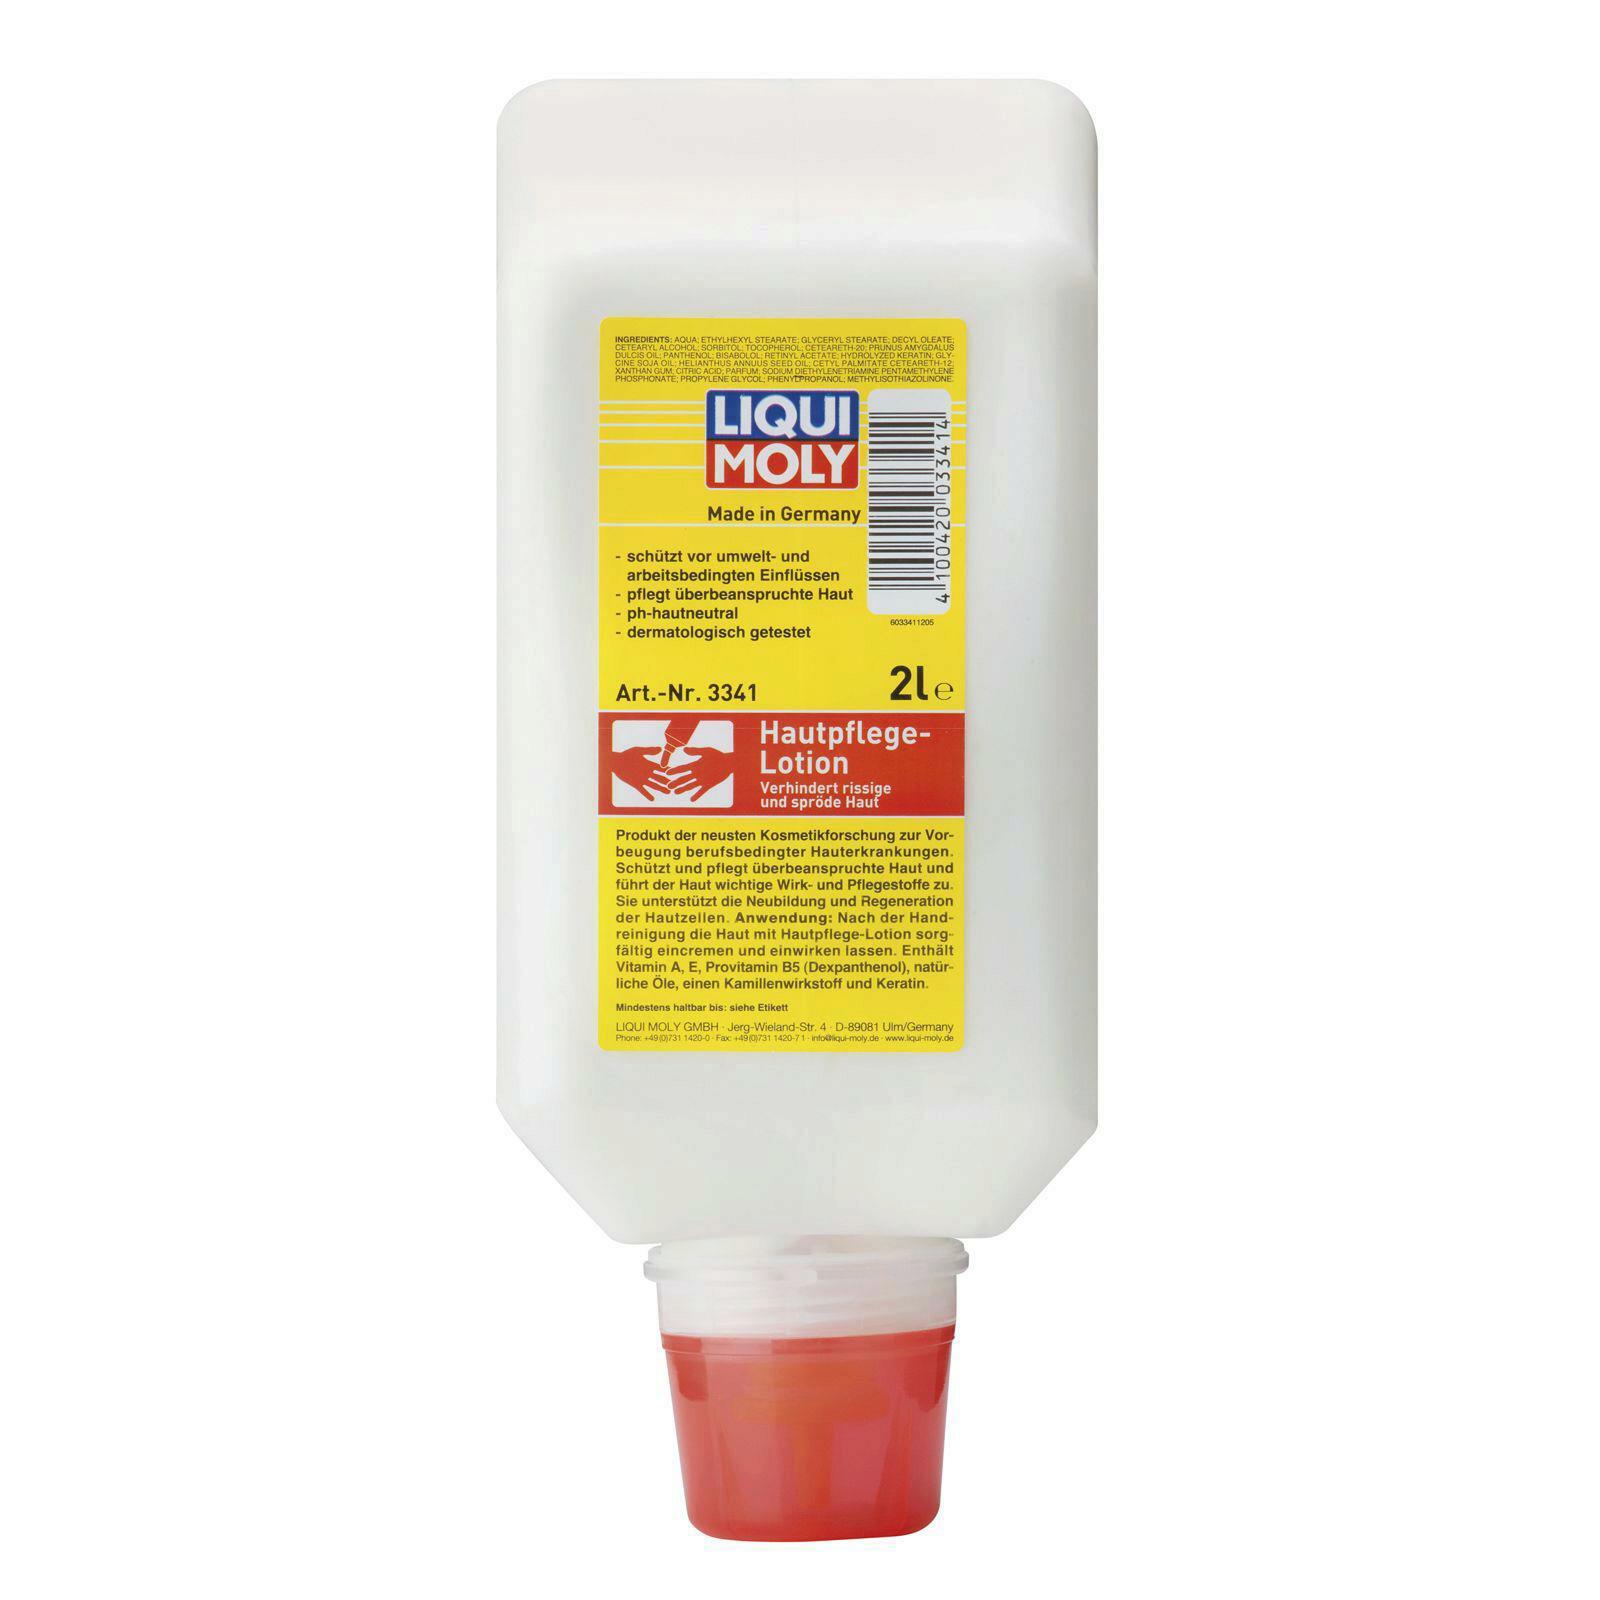 Liqui Moly Hautpflege-Lotion 2l